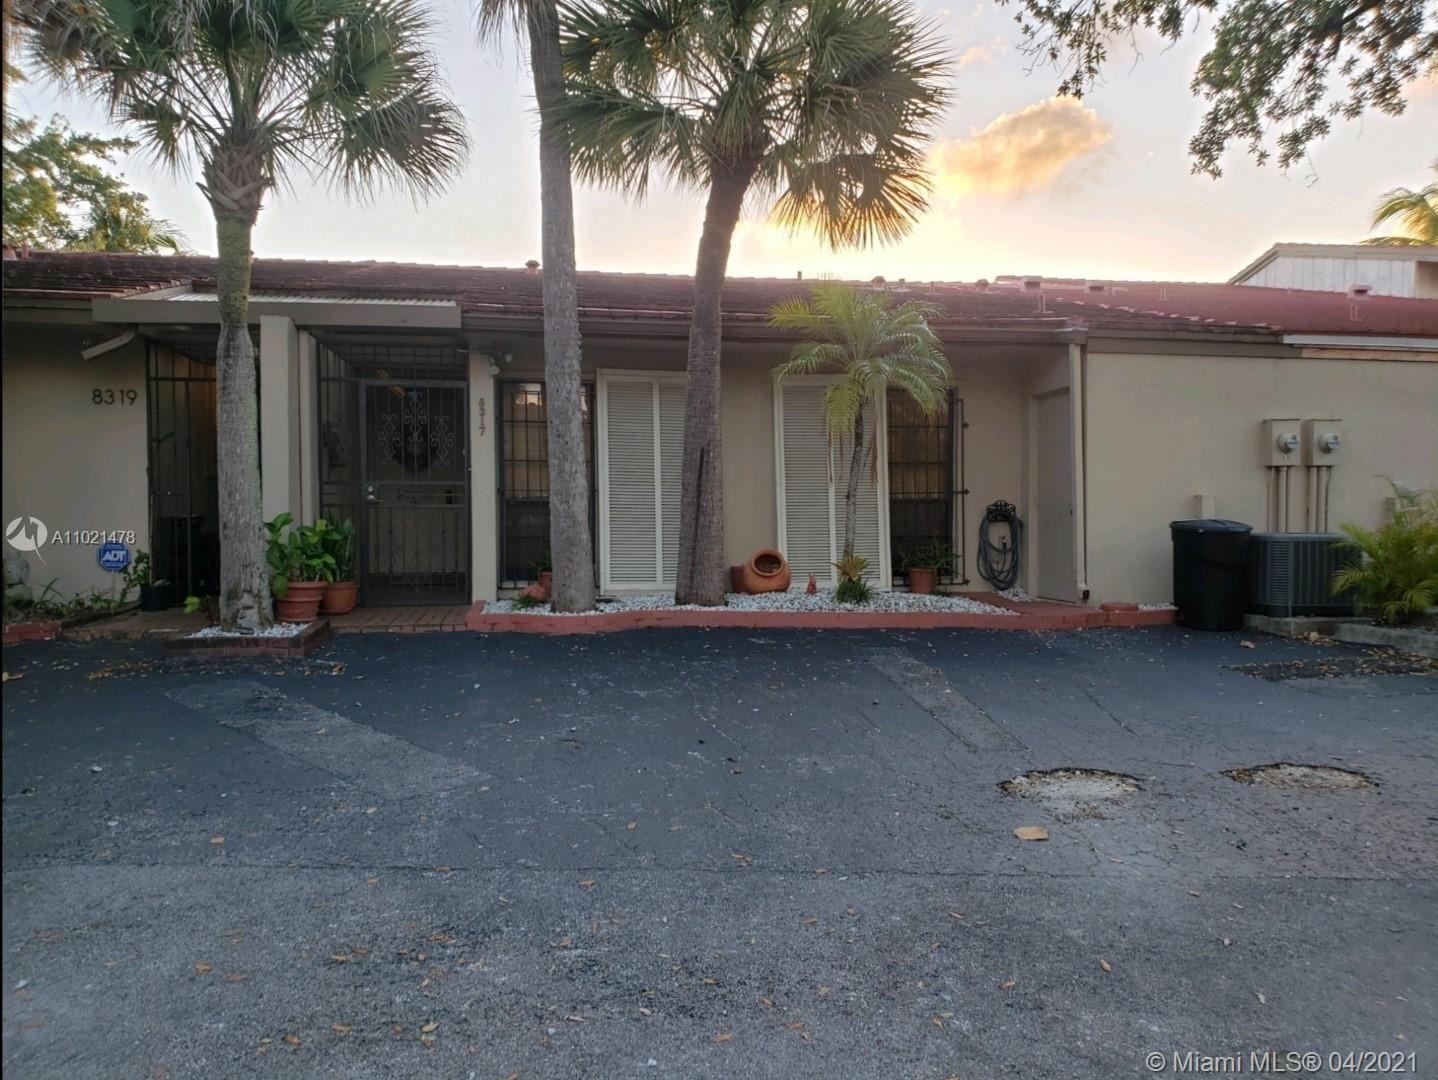 8317 Balgowan Rd, Miami Lakes, FL 33016 - #: A11021478